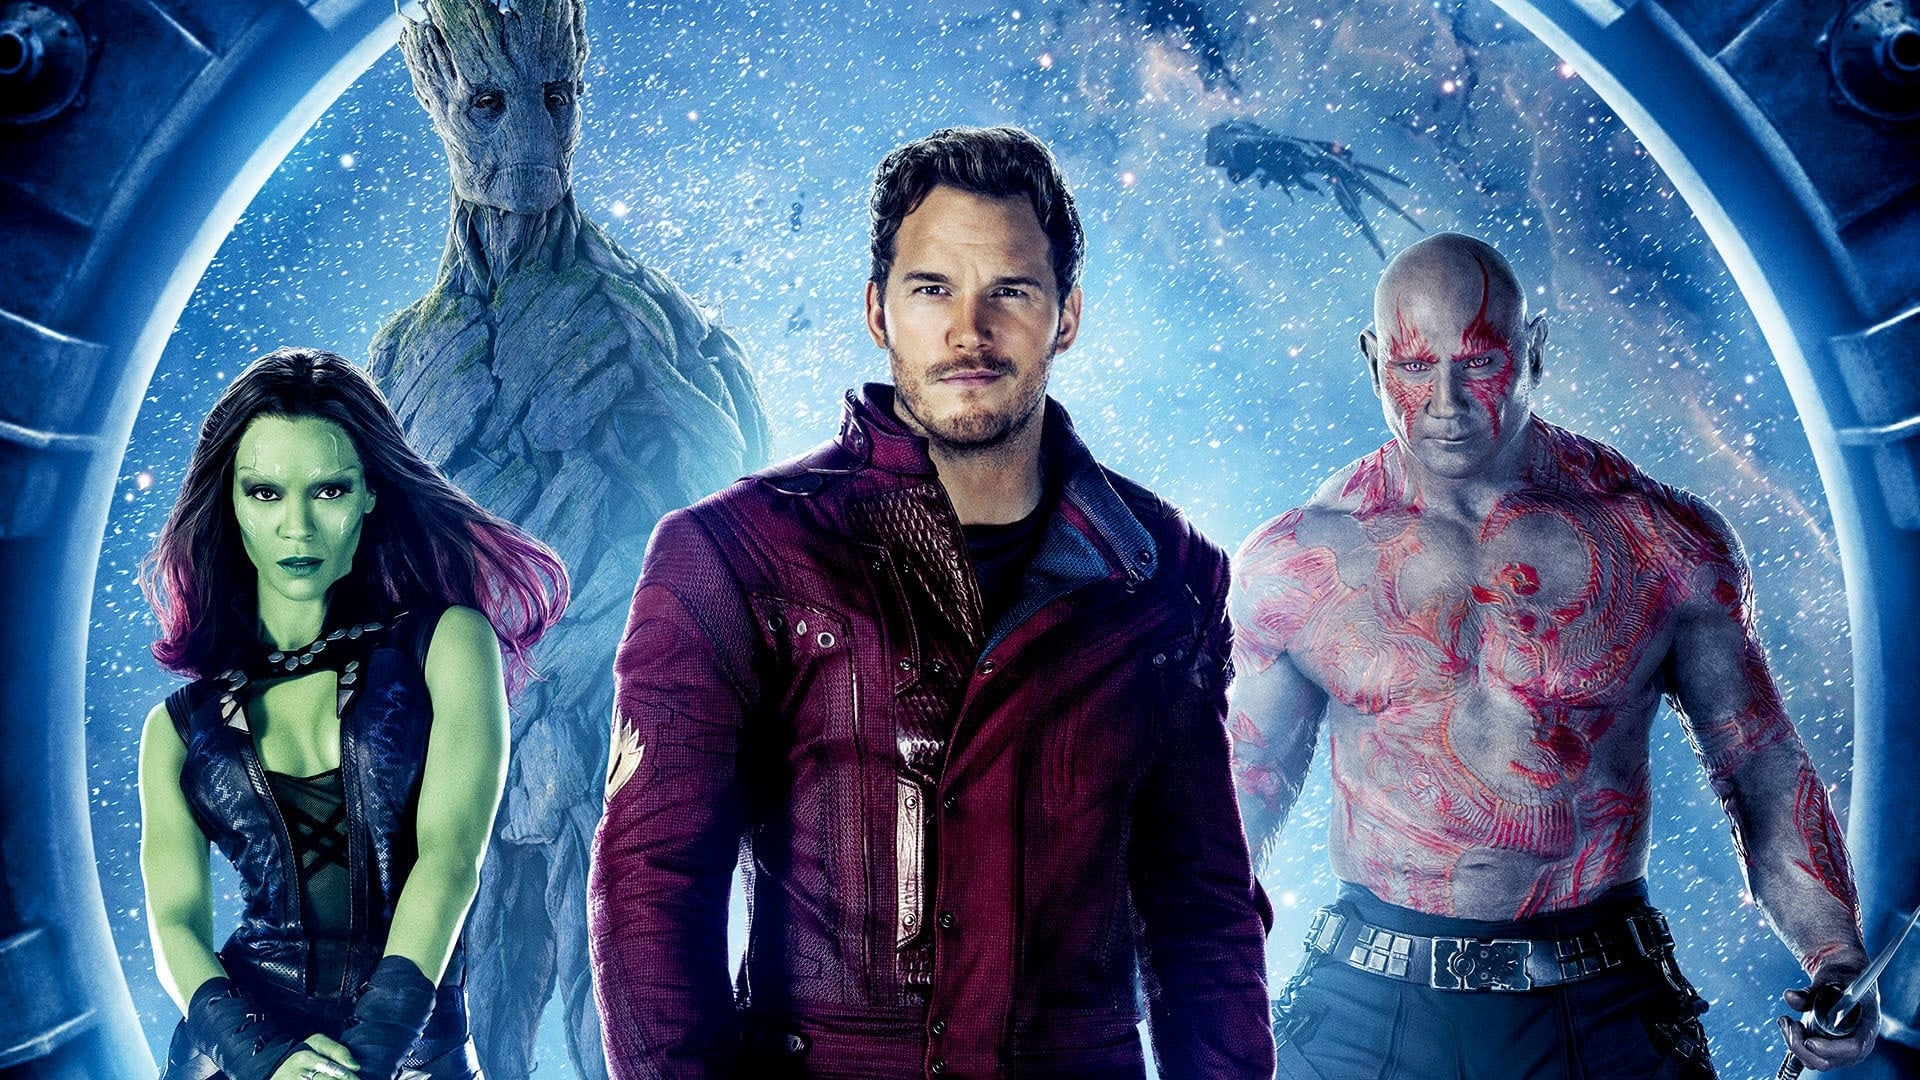 Photo extraite de Guardians of the Galaxy